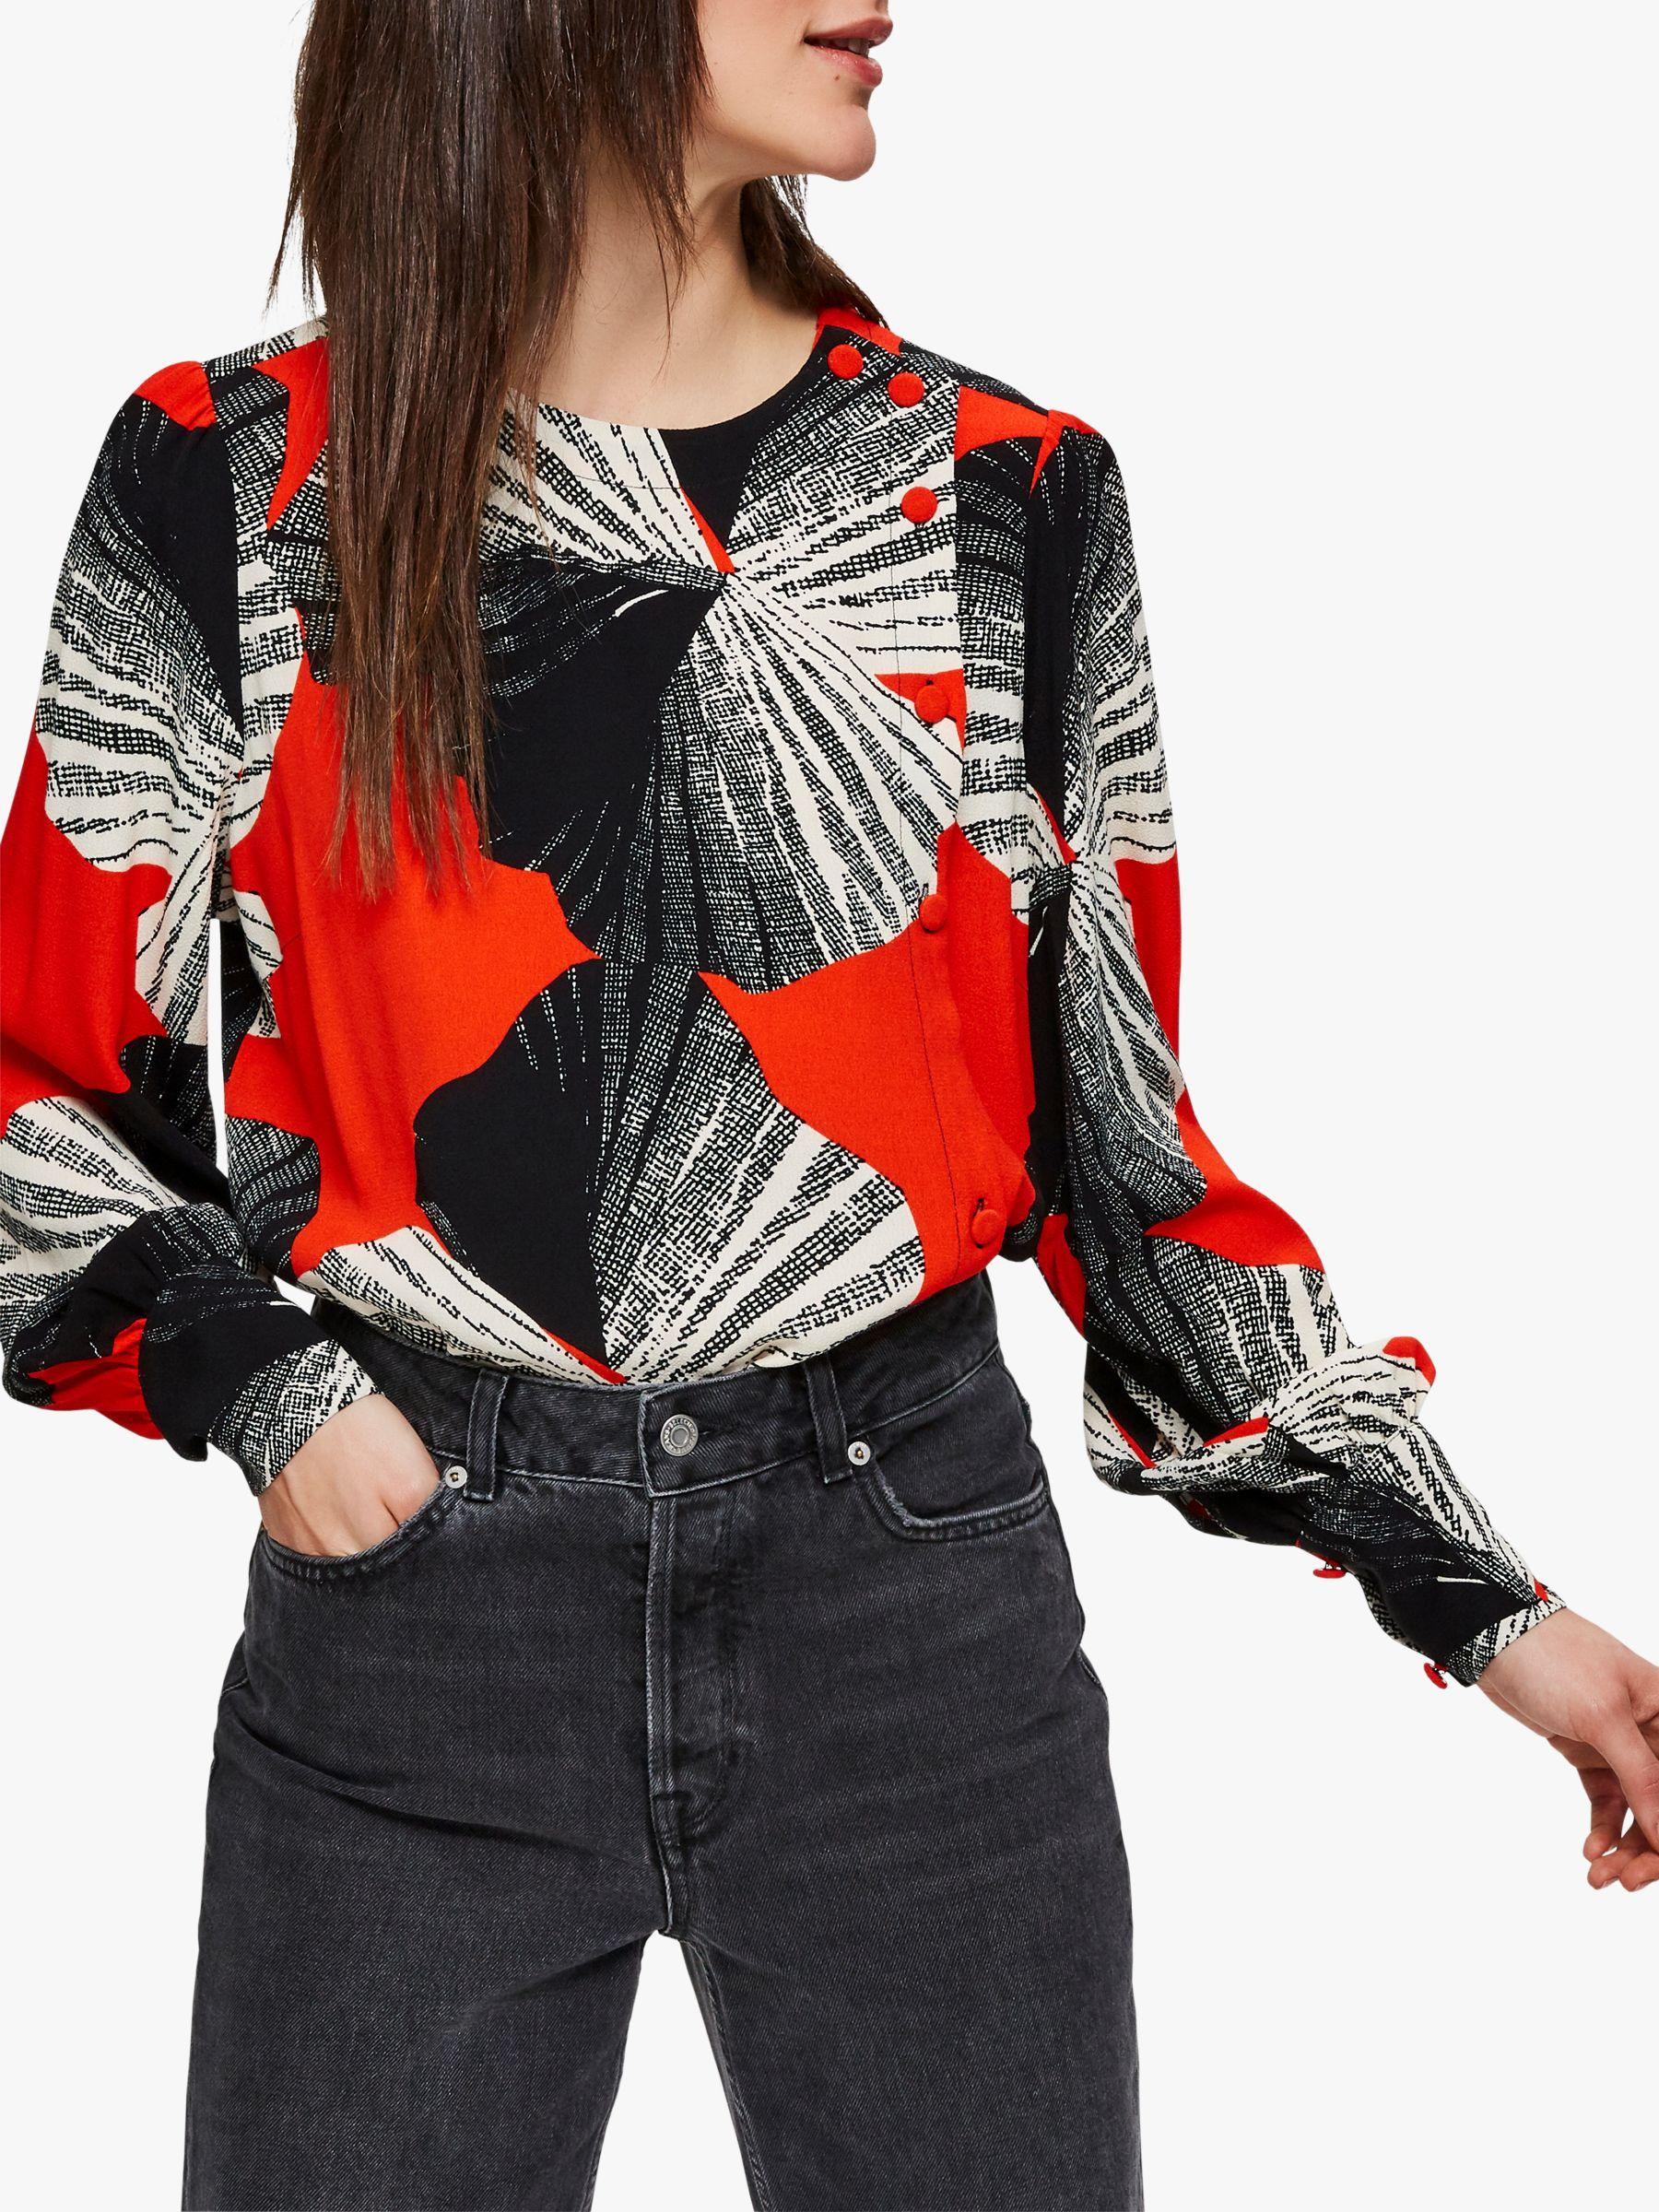 Selected Femme Selected Femme Kairi Top, Orange/Multi